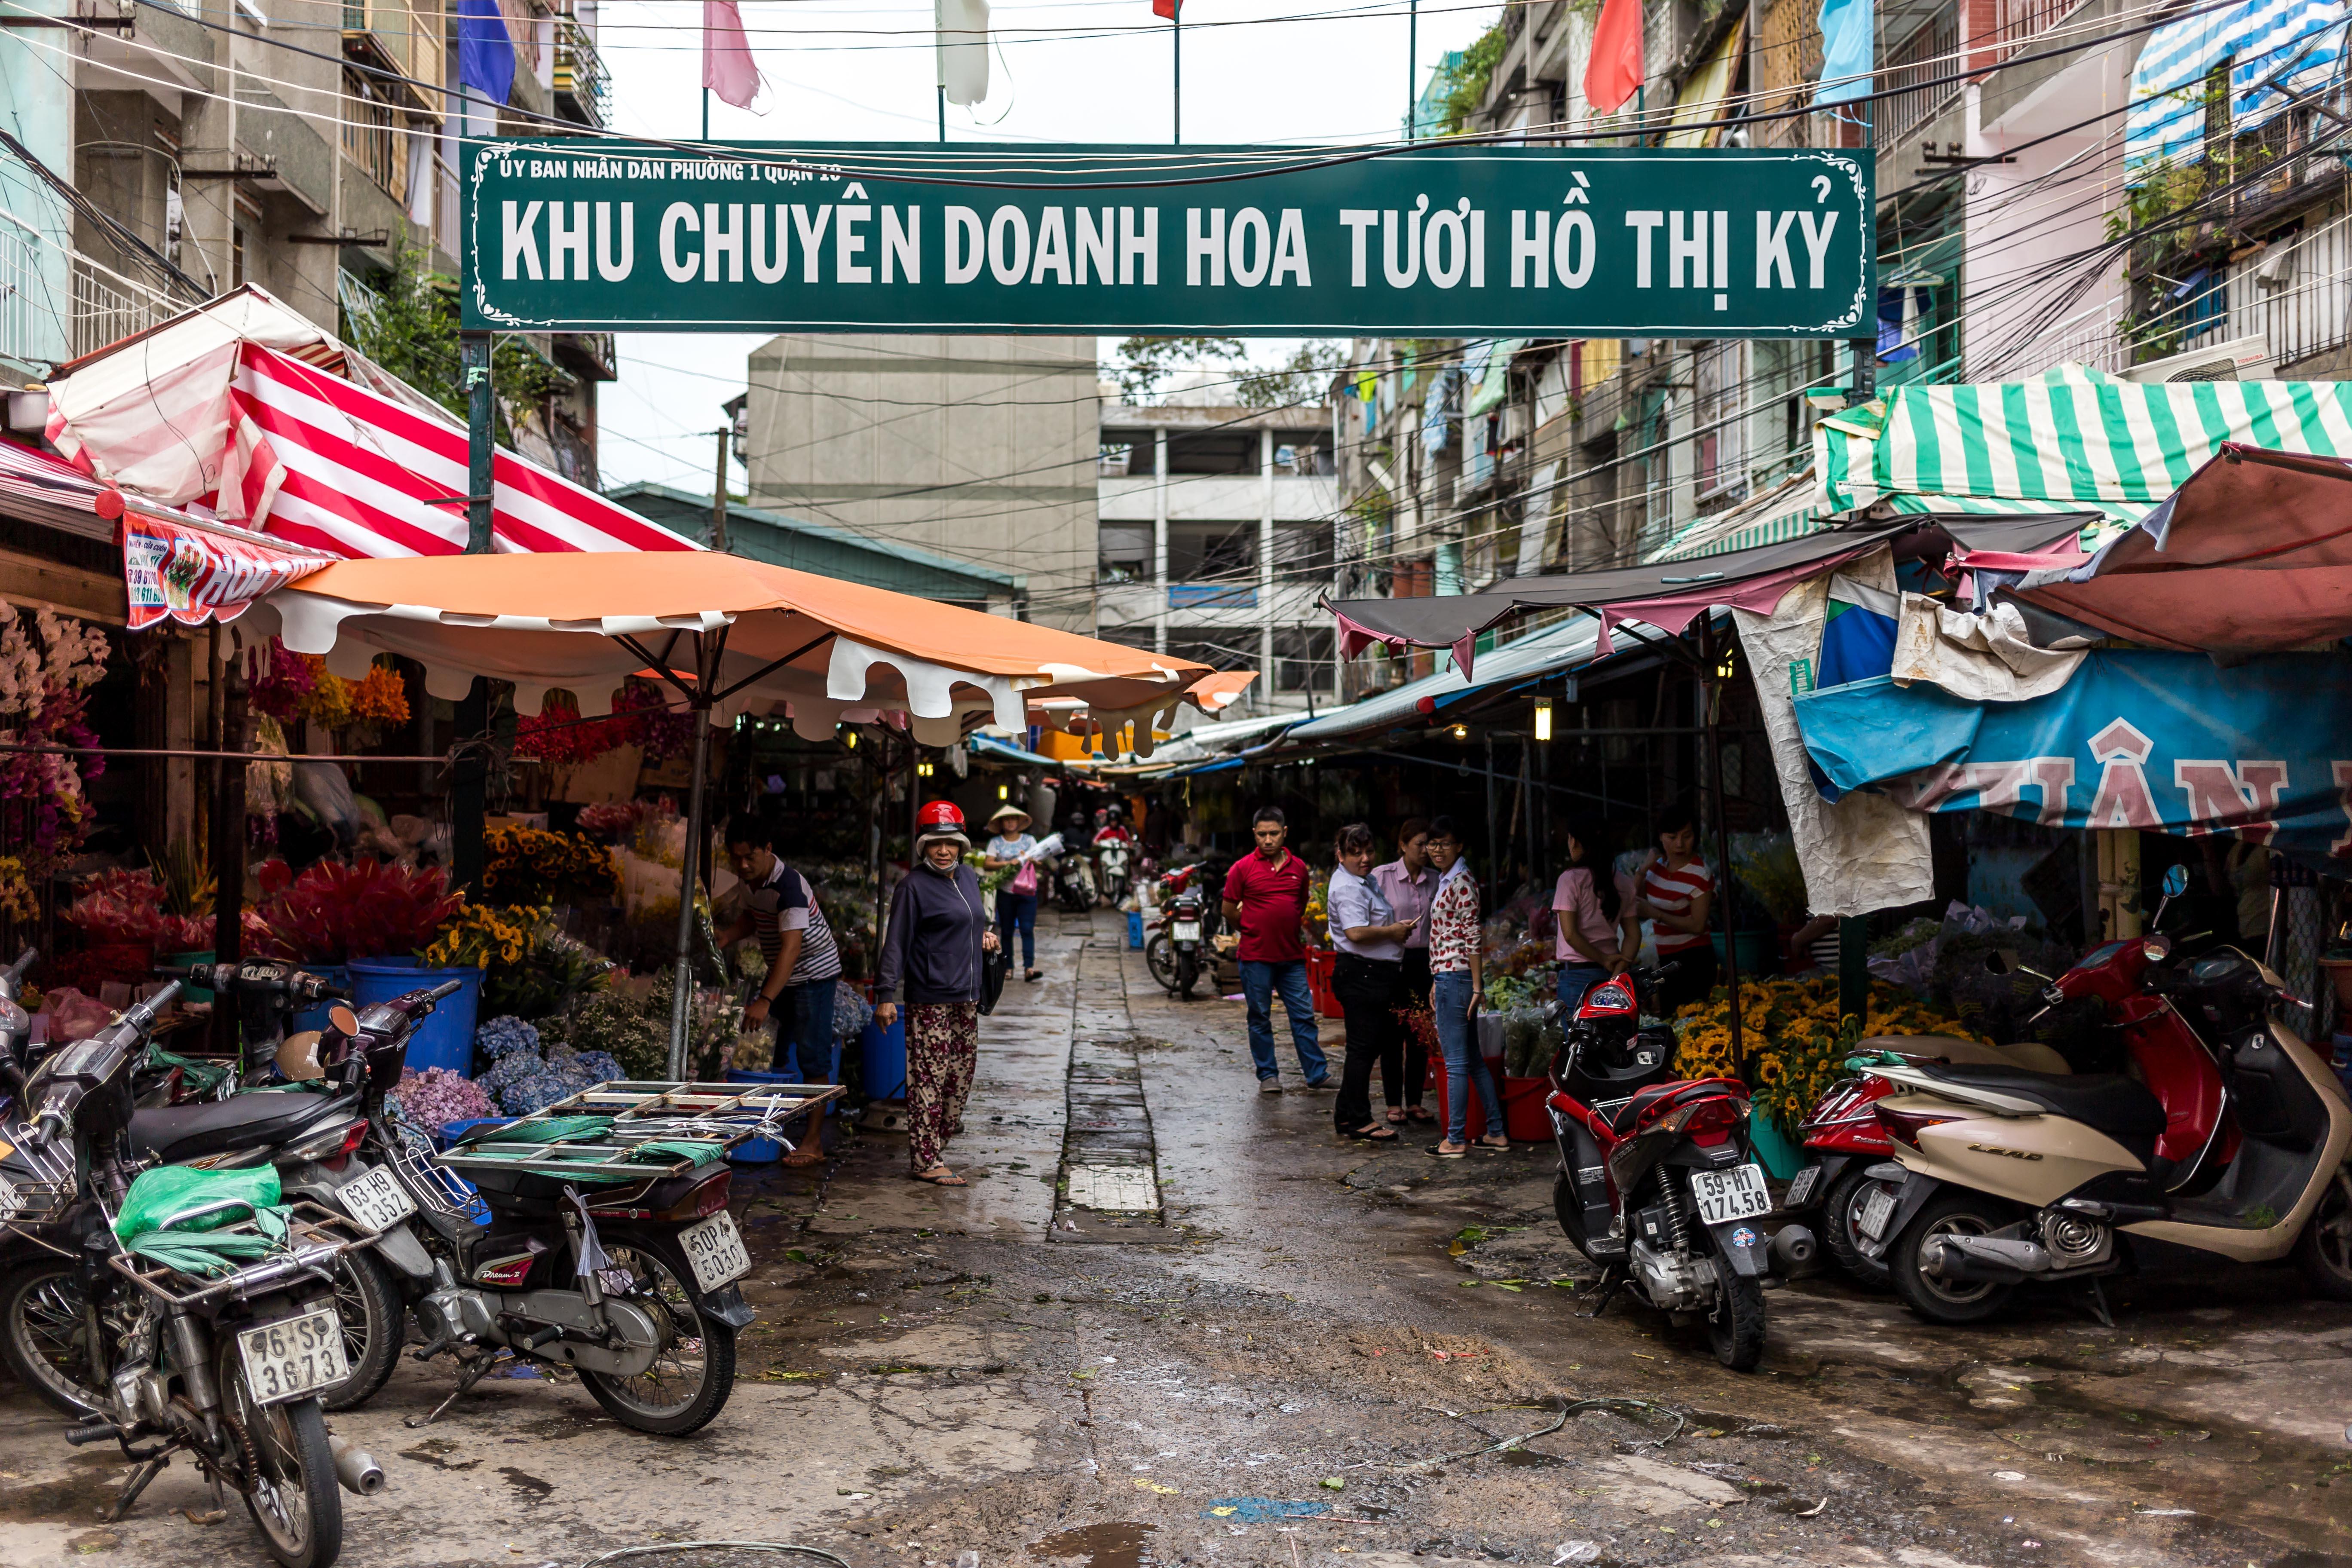 Ho Thi Ky Flower Market saigon flower market